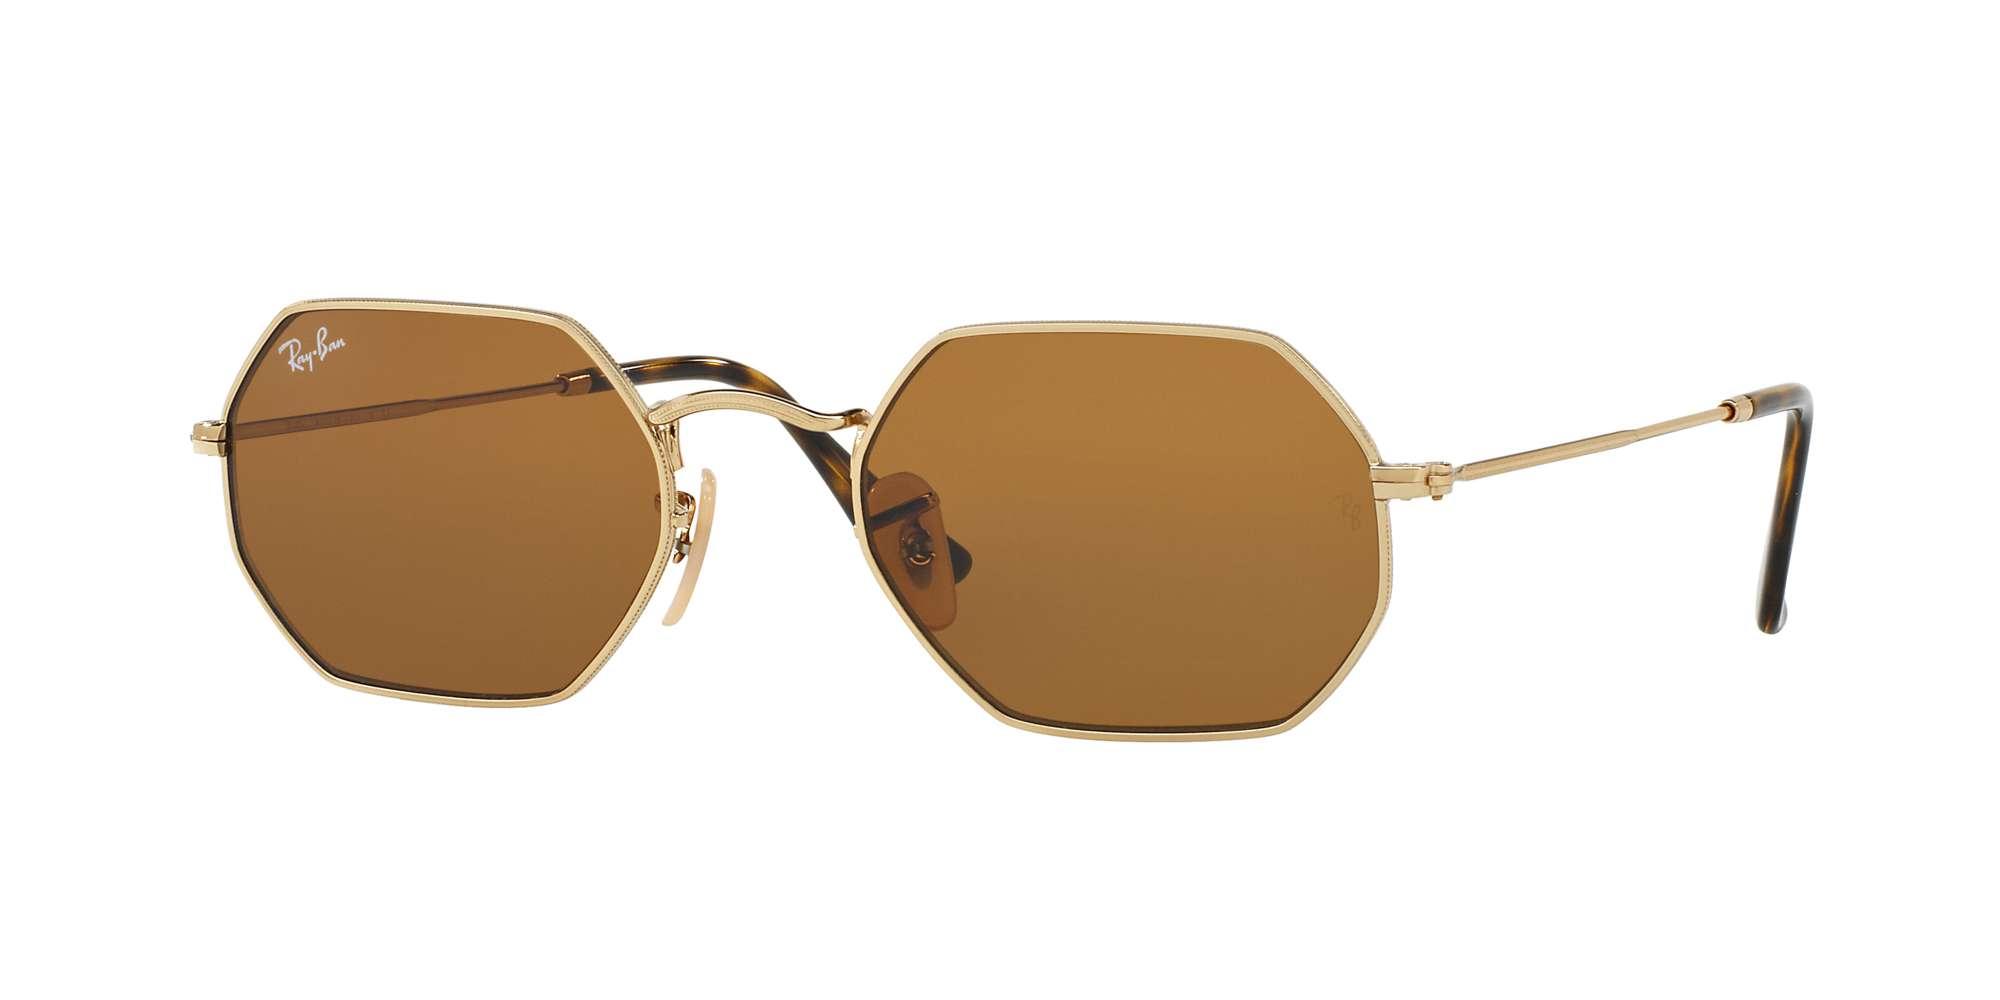 GOLD / BROWN lenses